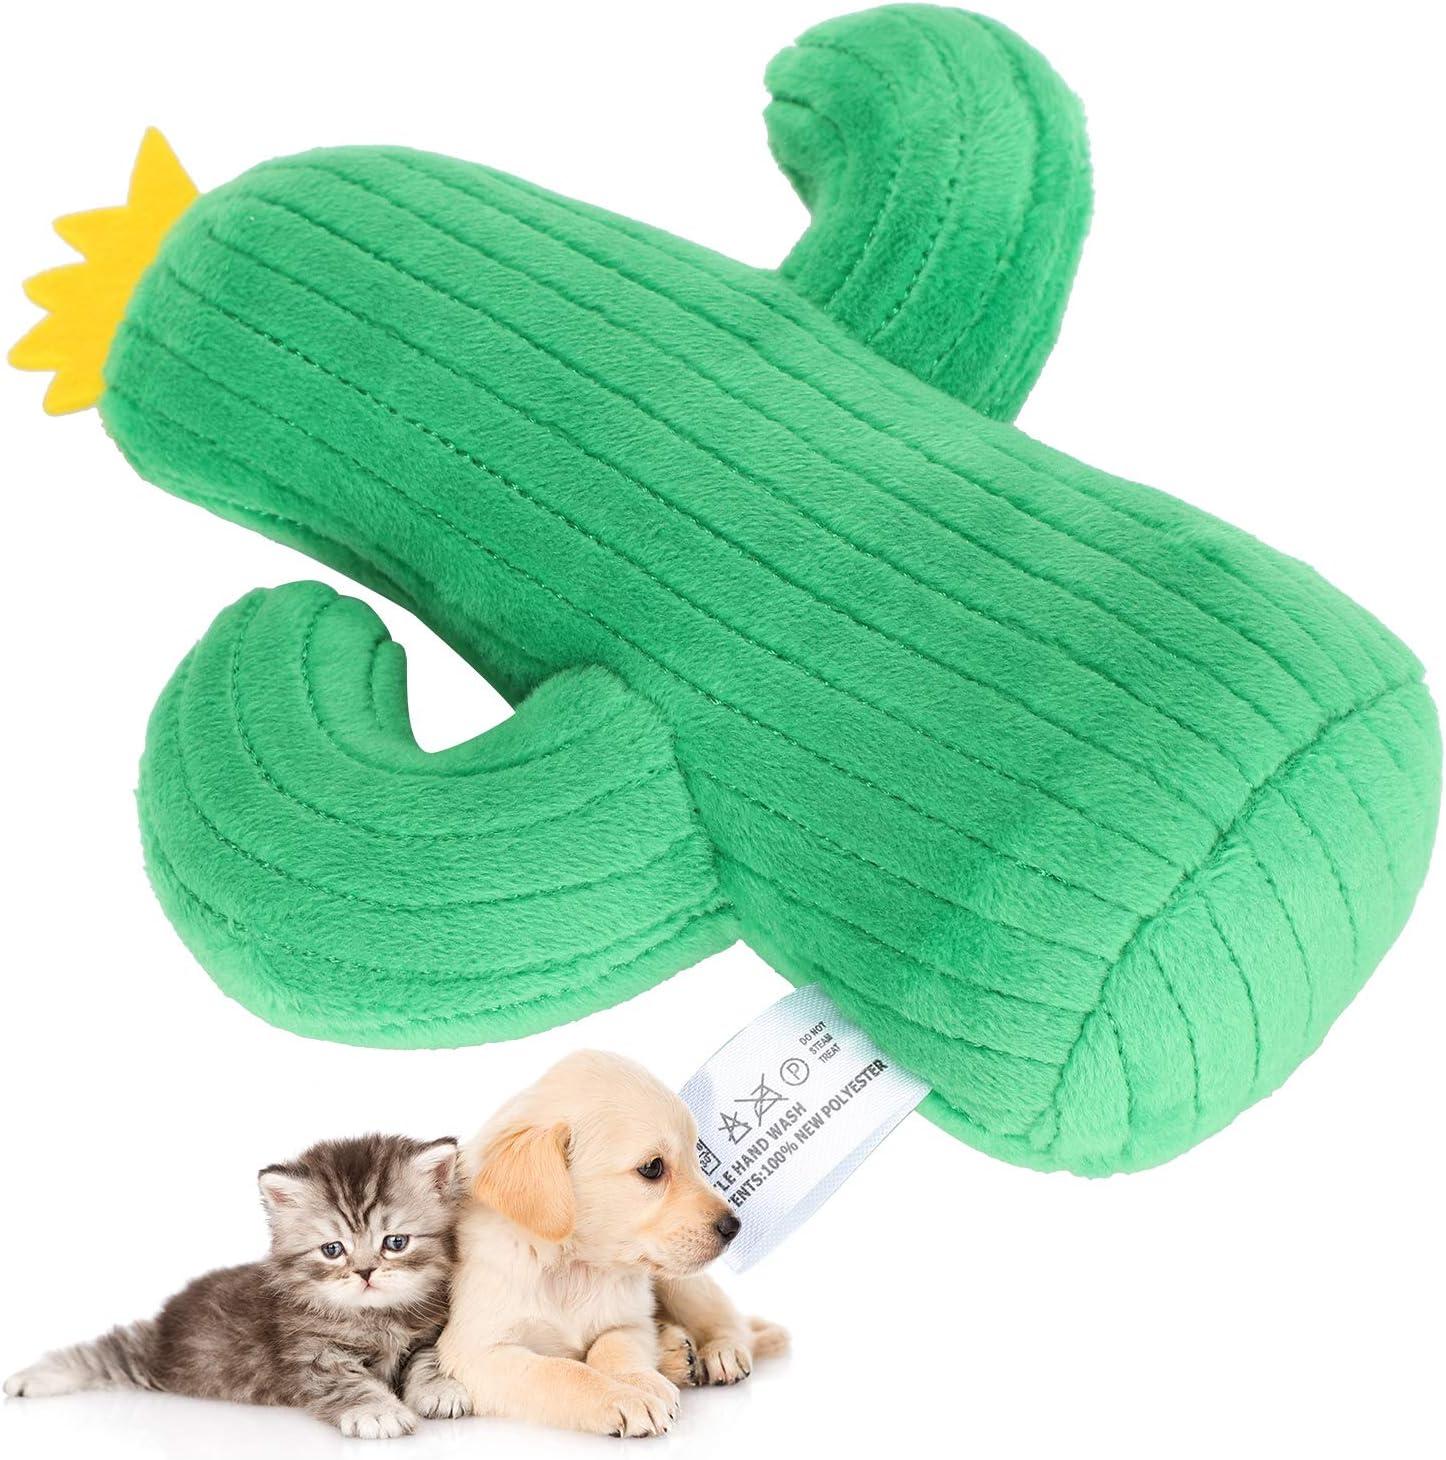 XQAQX Ranking TOP2 Pet Squeak Toys Dog Toy Plush Same day shipping Chew Small